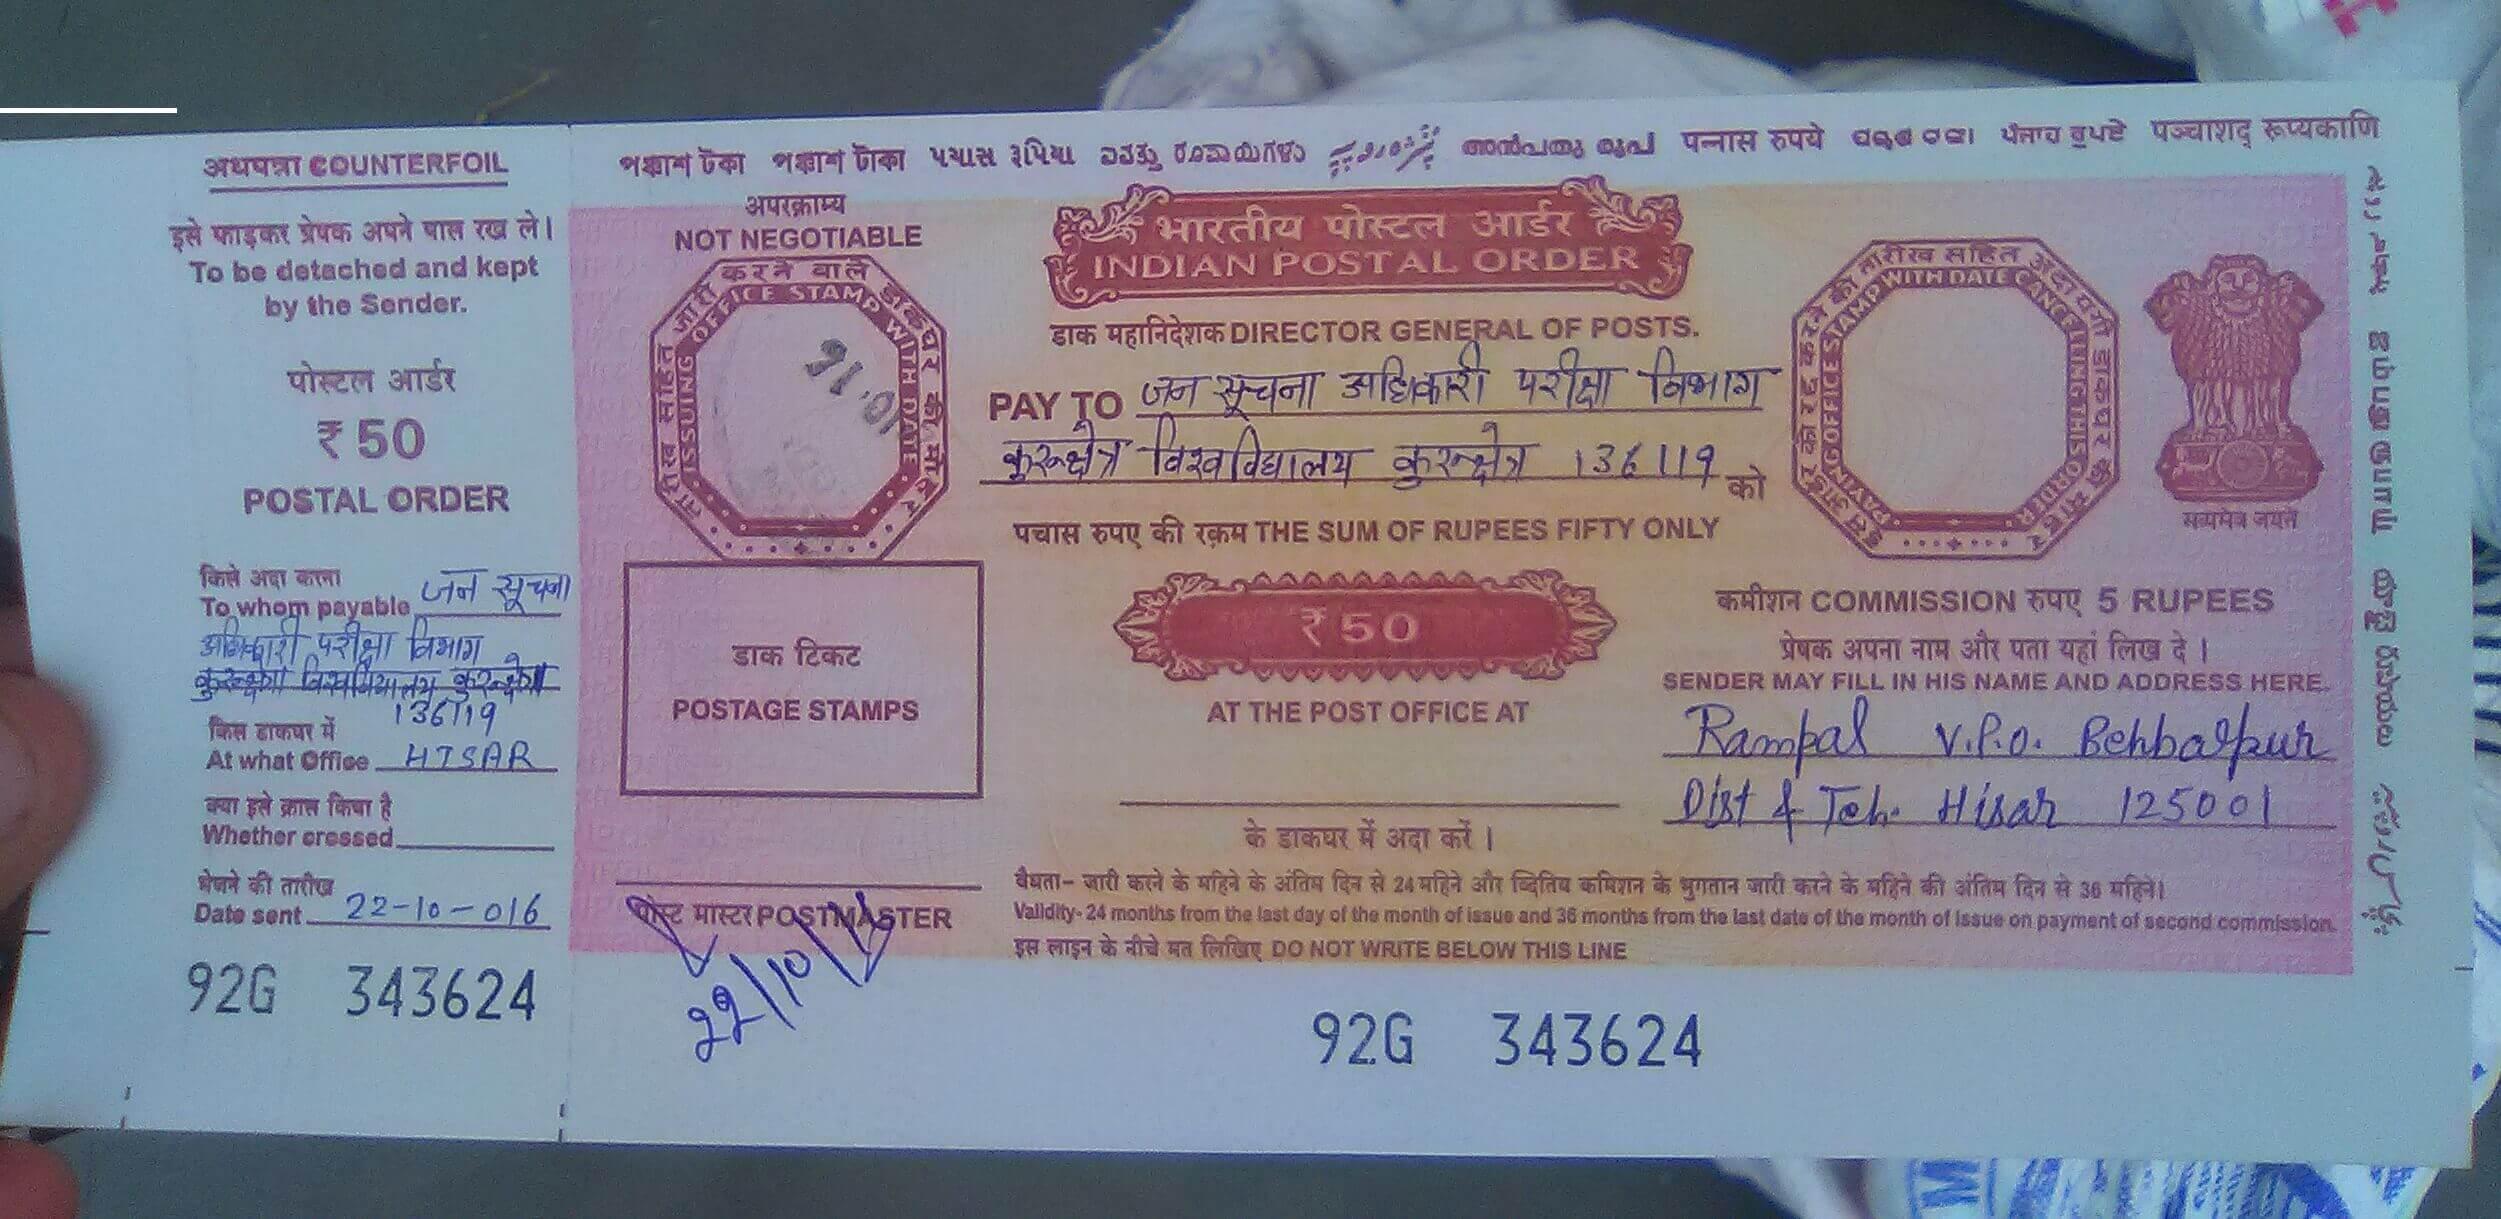 rti postal order payable to